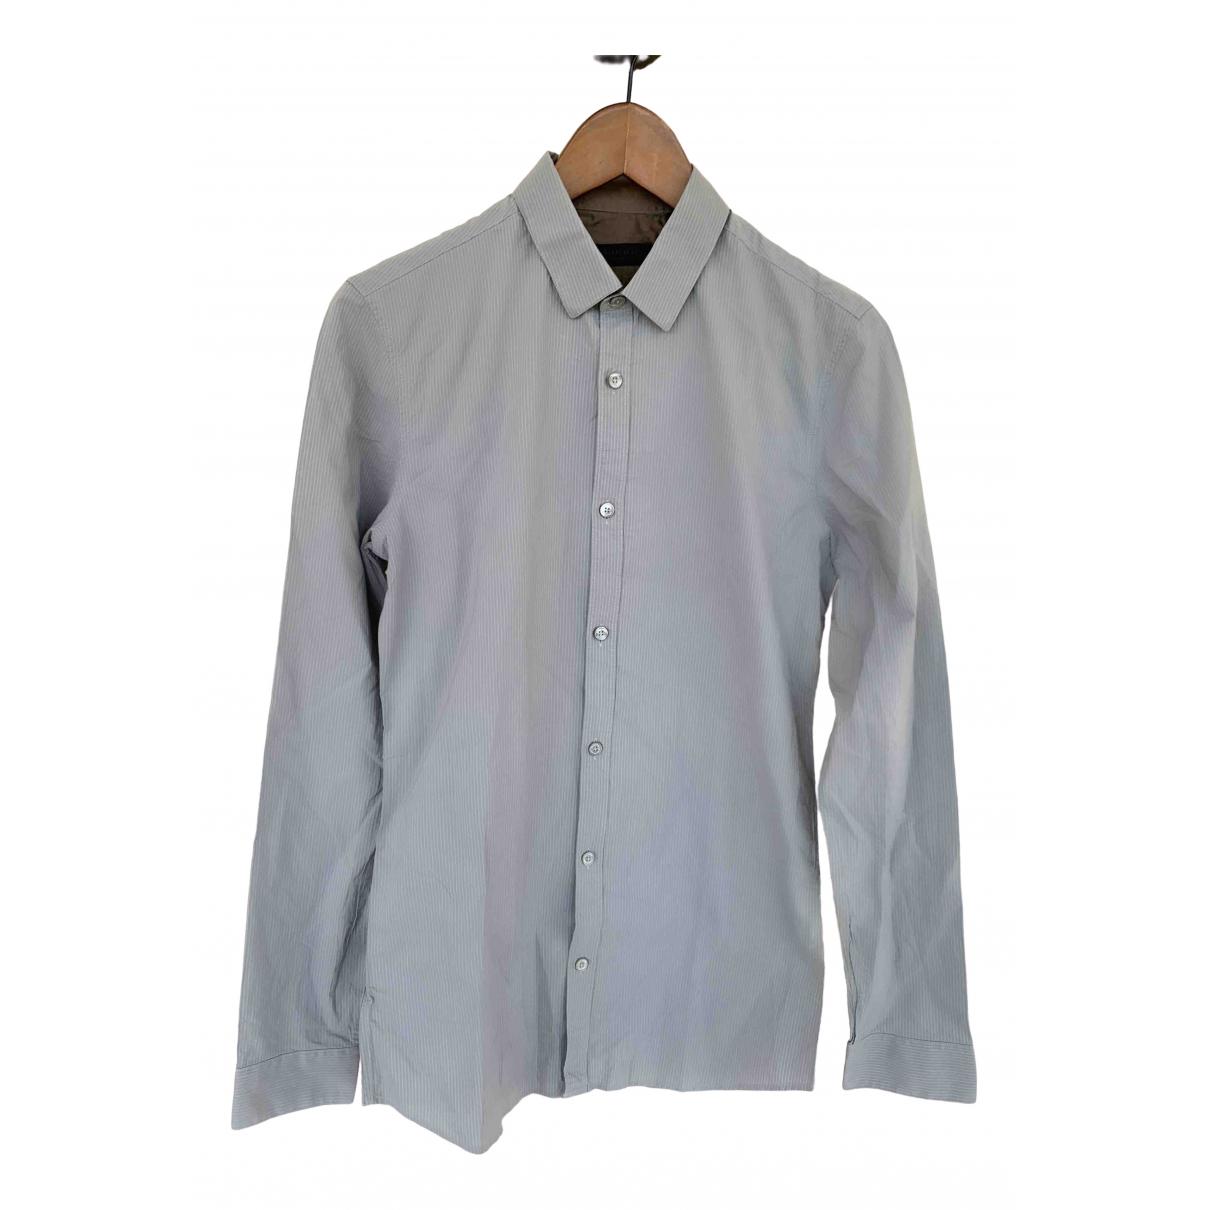 Burberry \N Grey Cotton Shirts for Men 39 EU (tour de cou / collar)